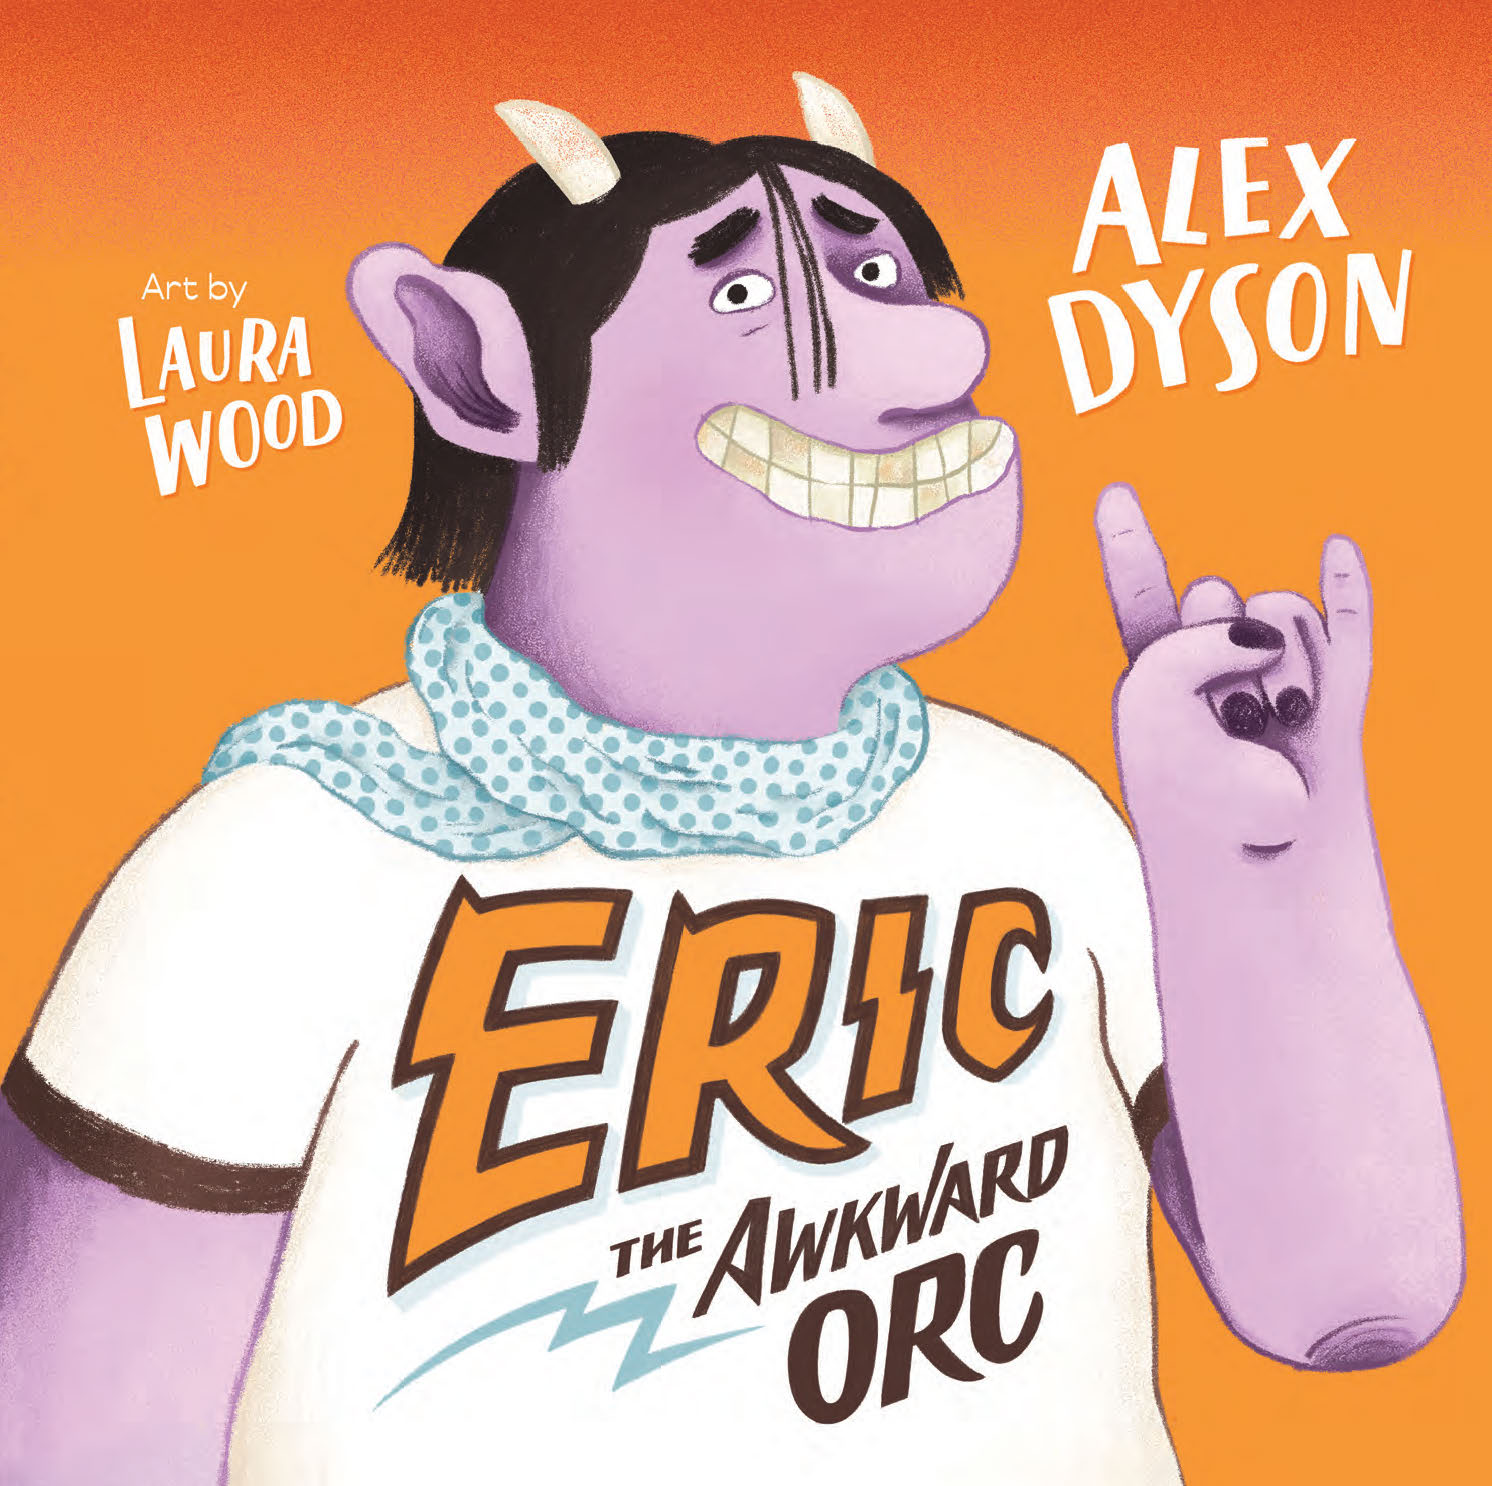 Eric the Awkward Orc